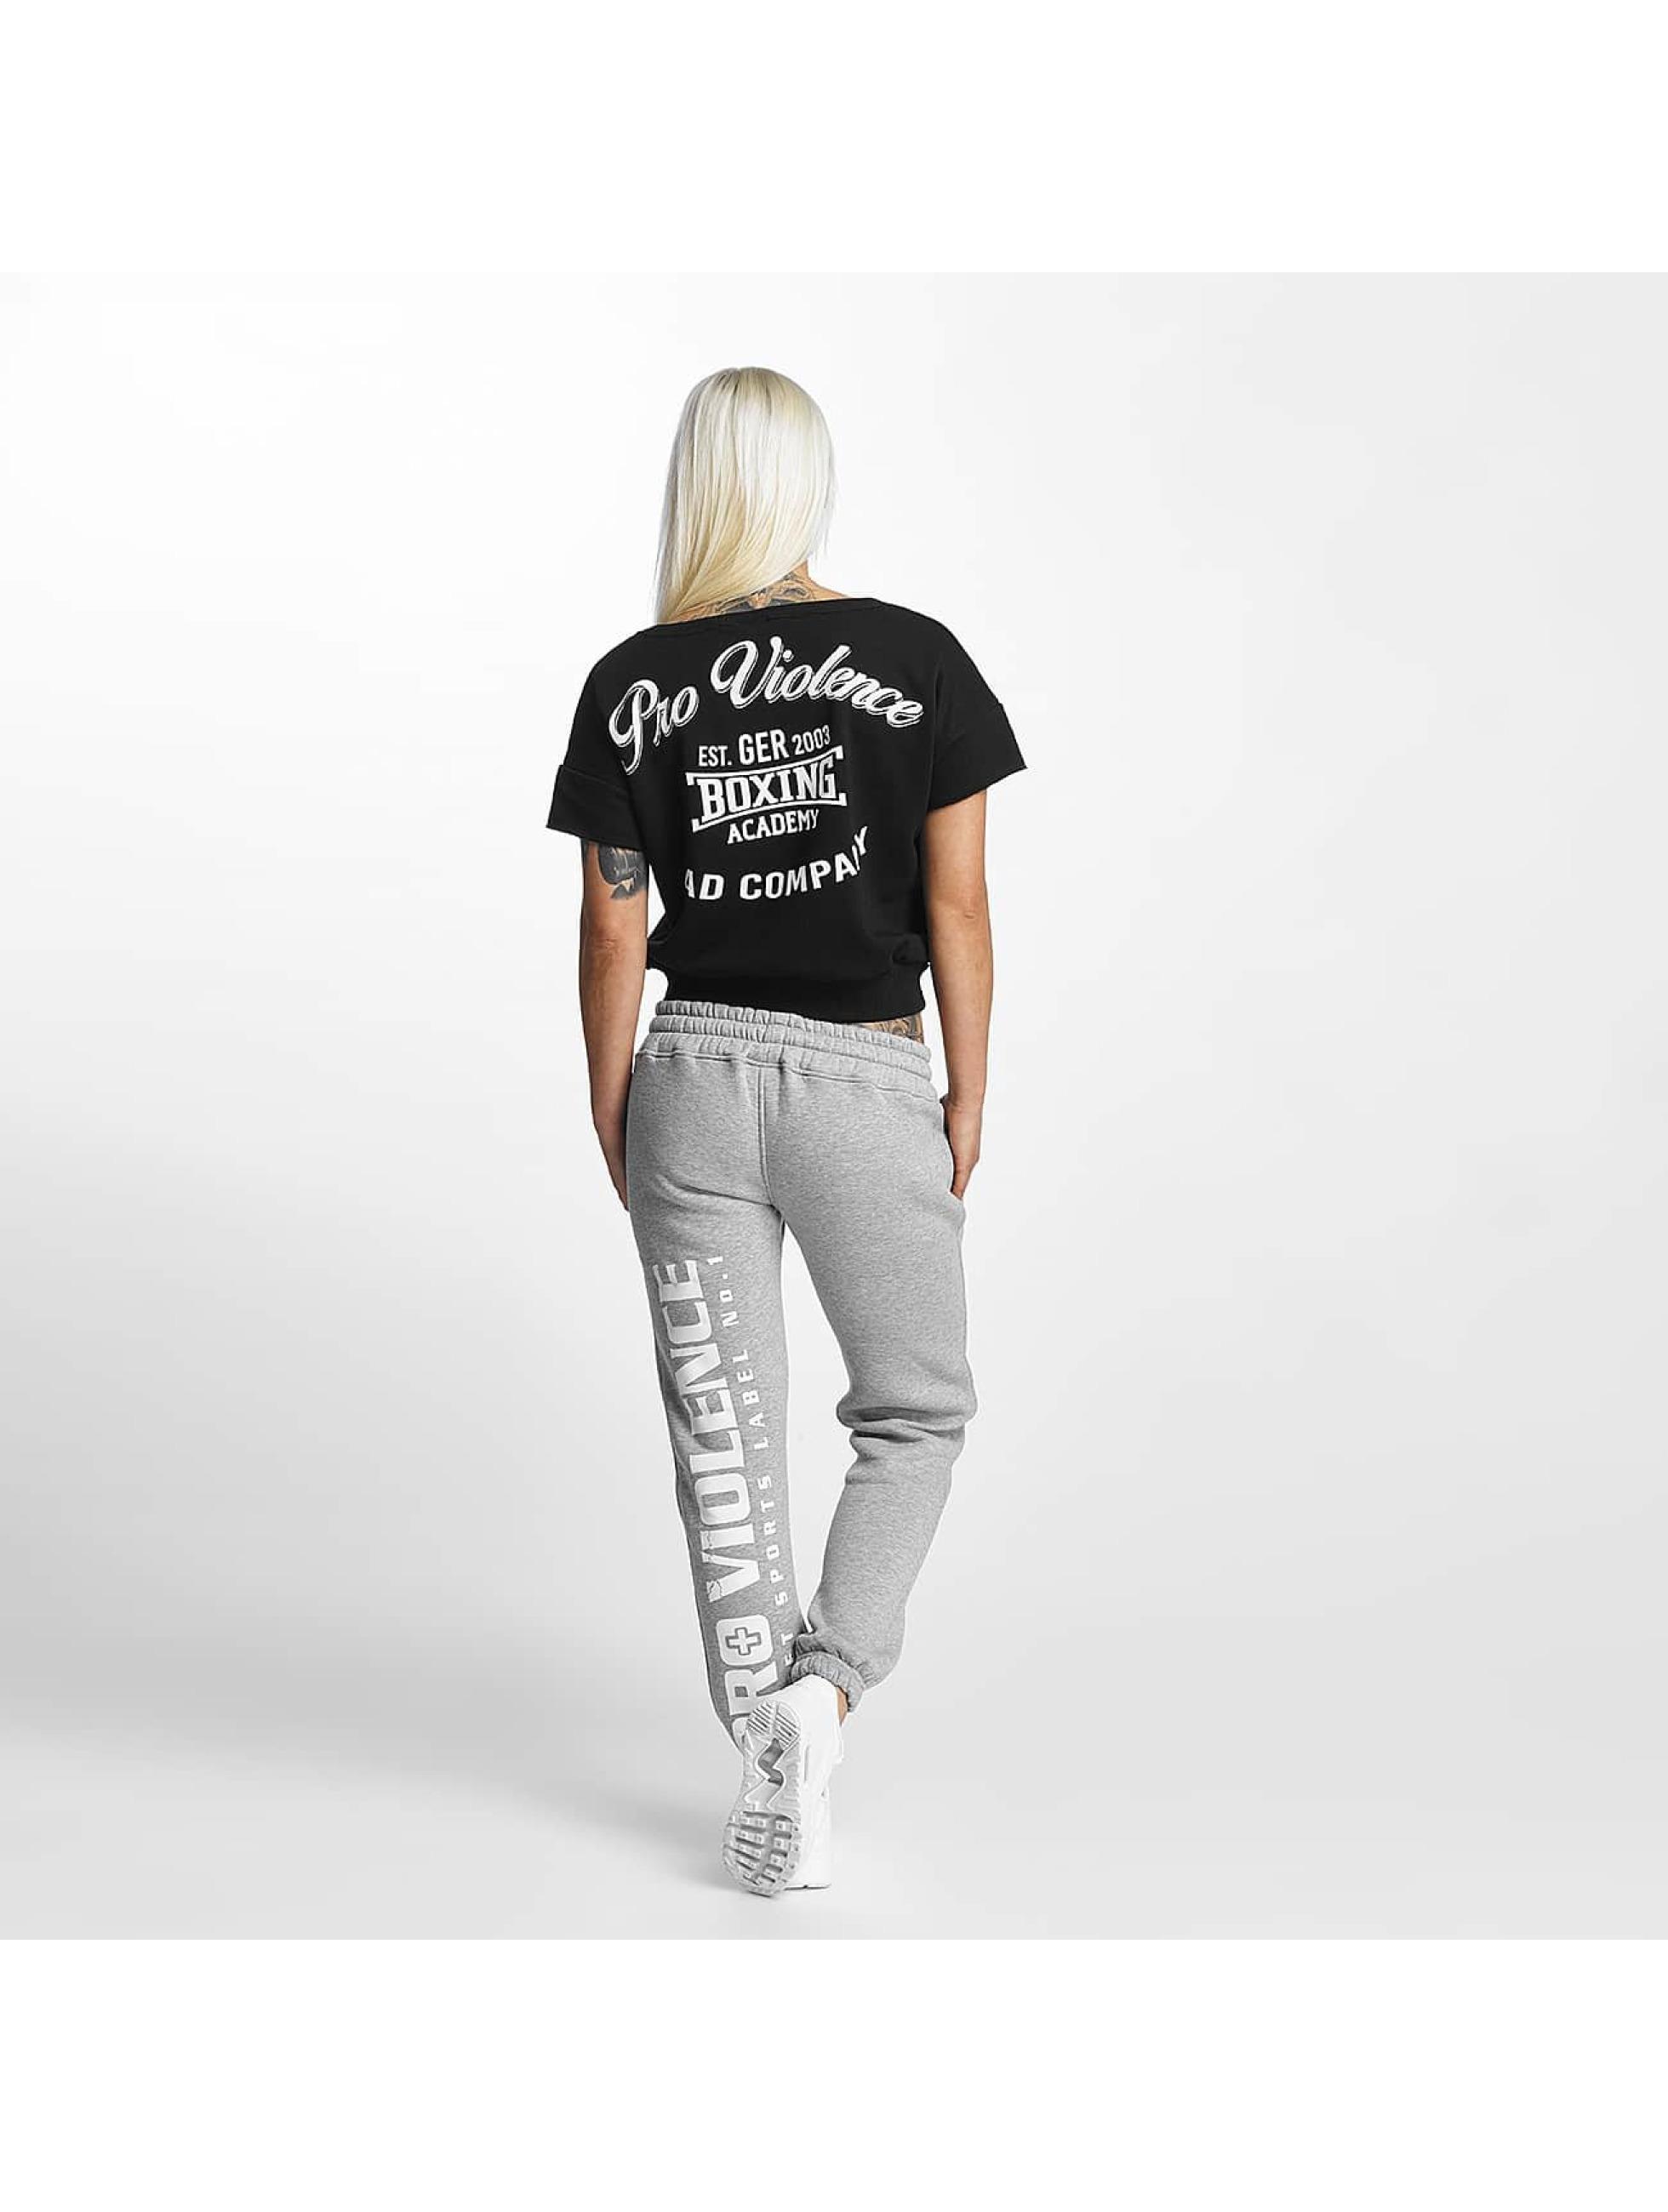 Pro Violence Streetwear T-Shirt Boxing schwarz